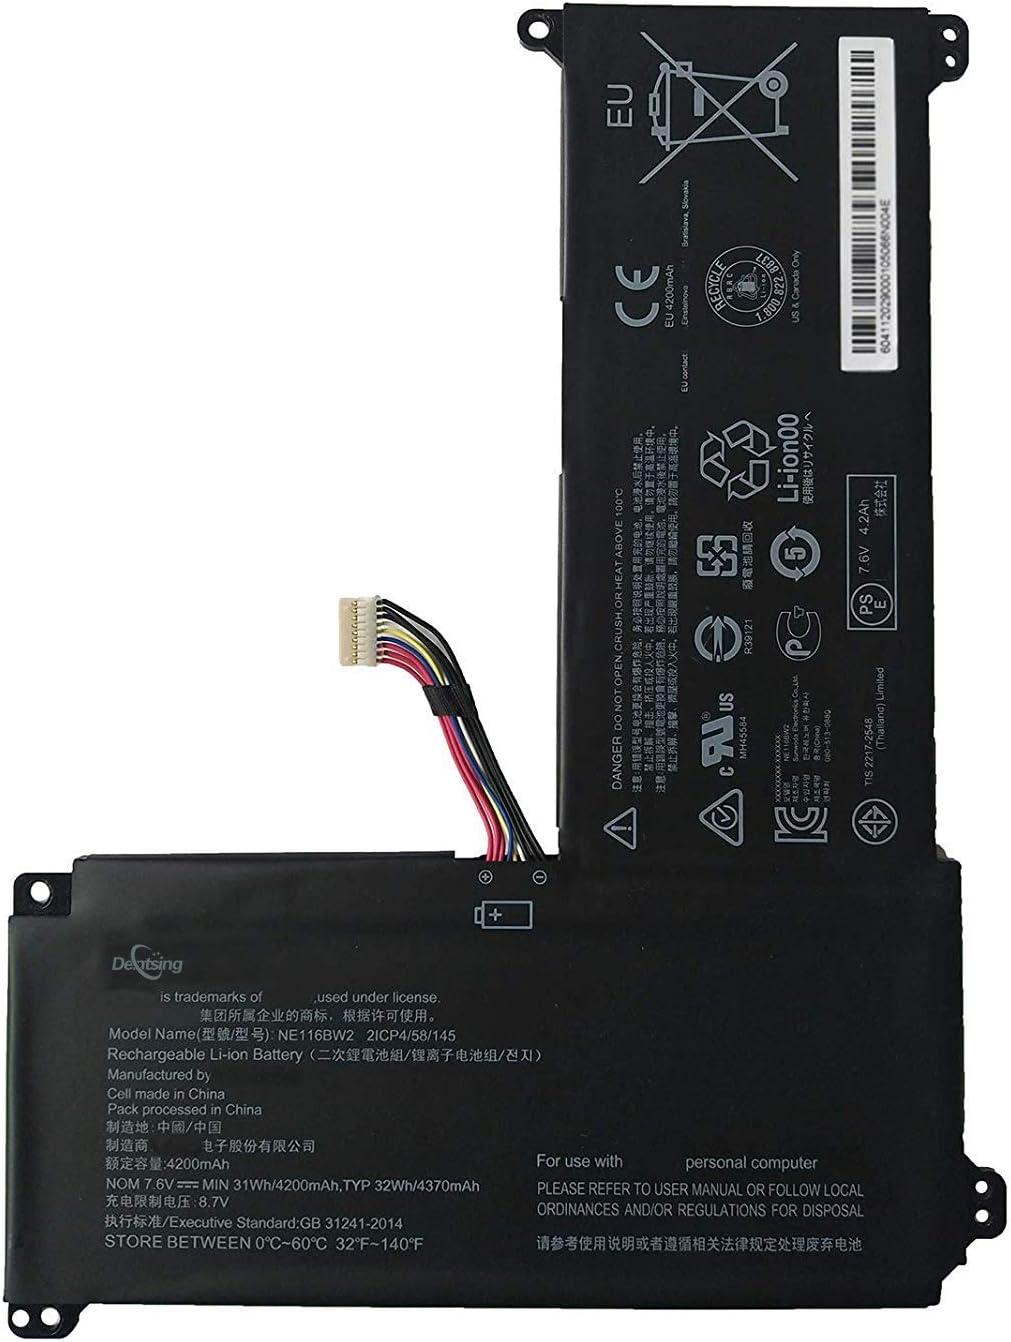 Dentsing NE116BW2 (7.5V 32Wh/4370mAh) Laptop Battery Compatible with Lenovo IdeaPad 110S 110S-11IBR Series Notebook 0813004 5B10M53616 2ICP4/58/145